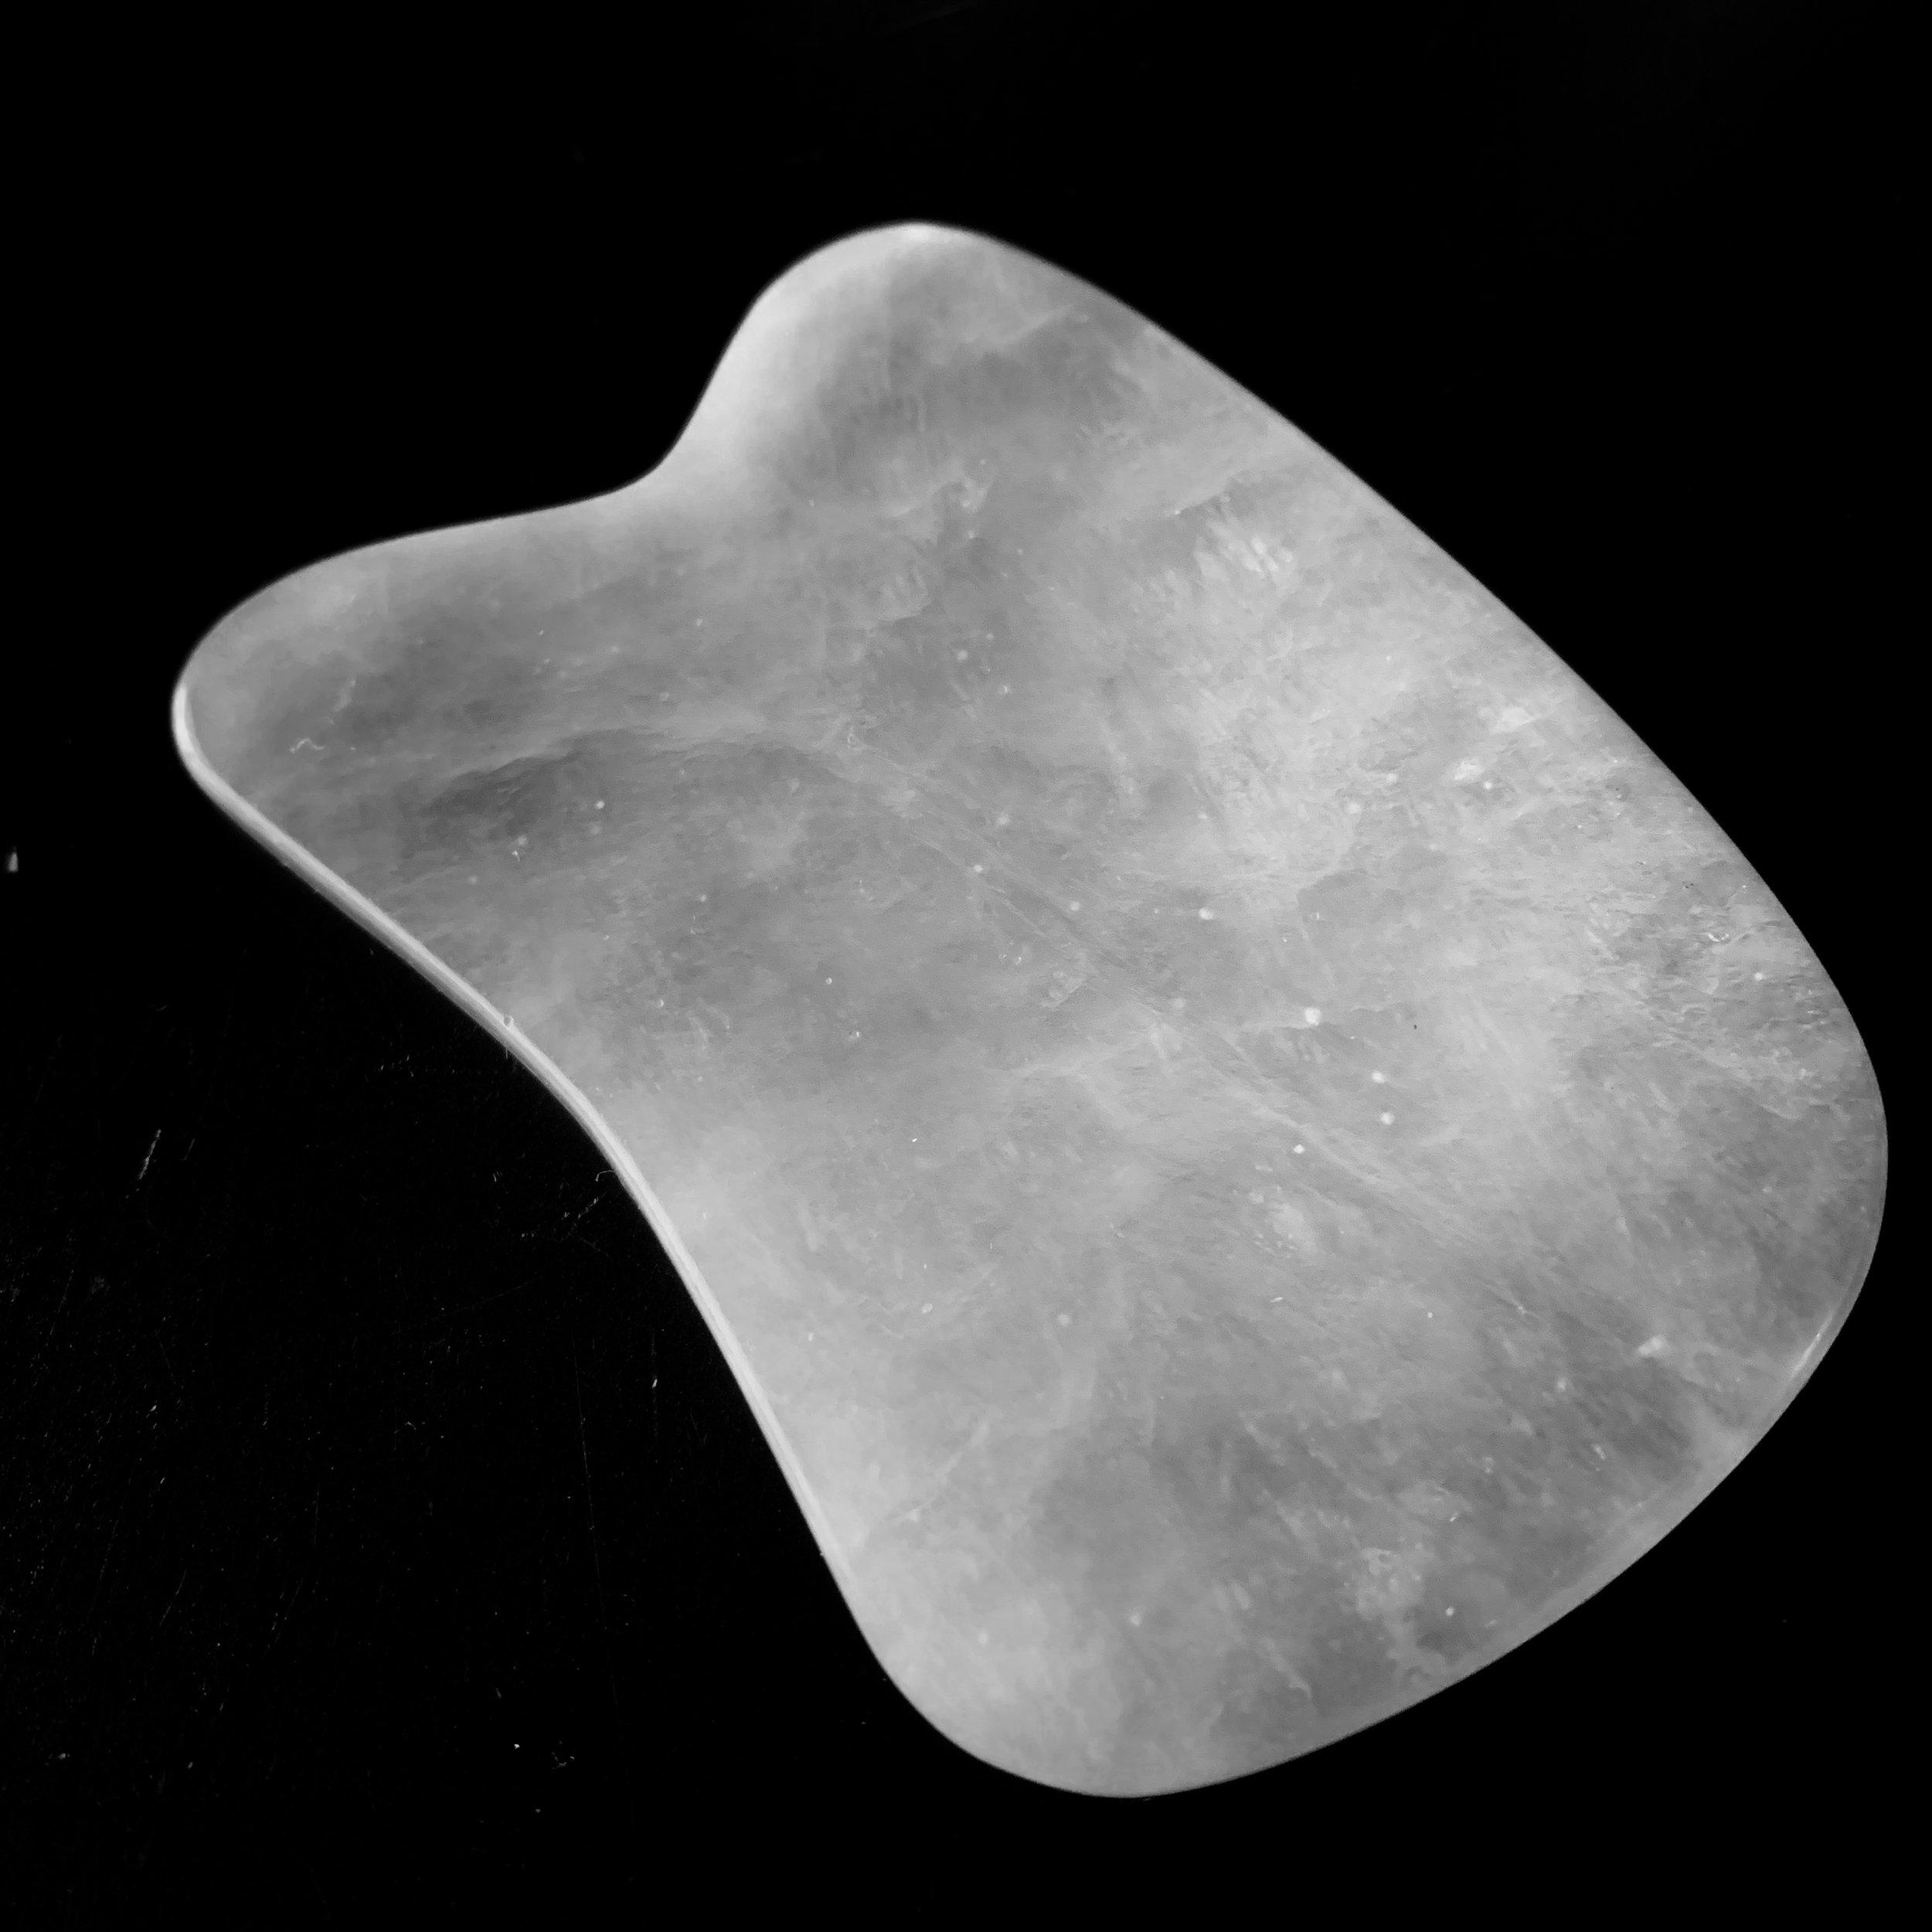 My jade gua sha tool